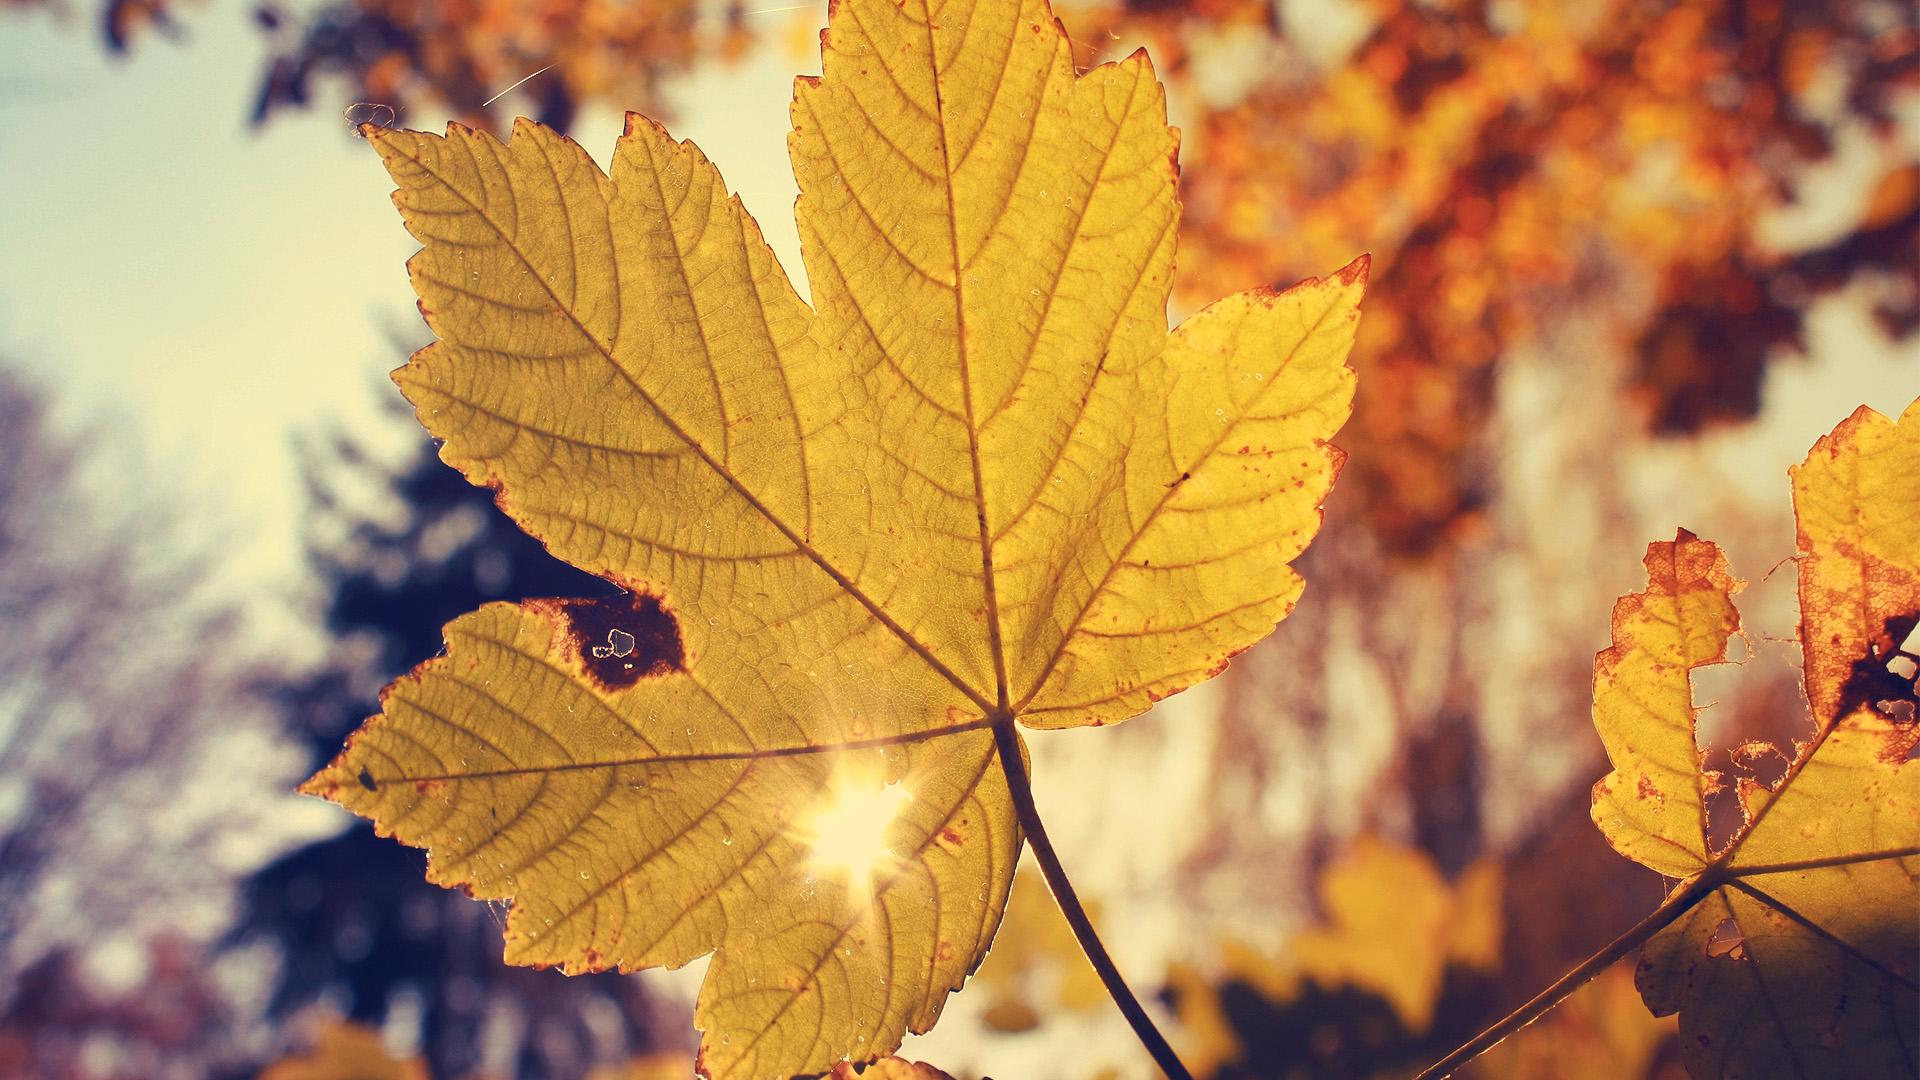 autumn wallpapers gallery d5jbtxq wallpaper 1920x1080